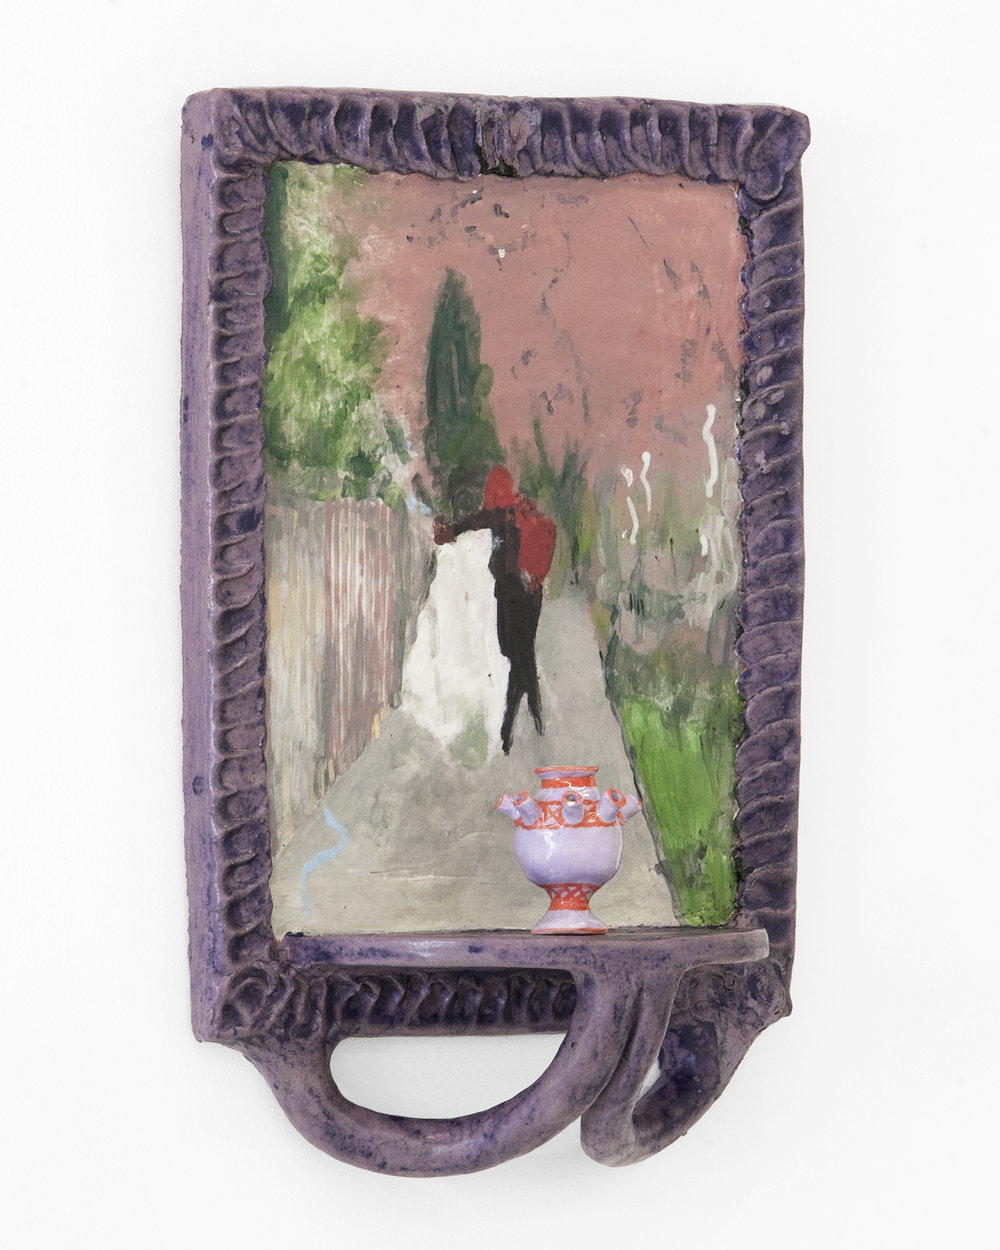 paigevalentien_paintingshelf_1.jpg